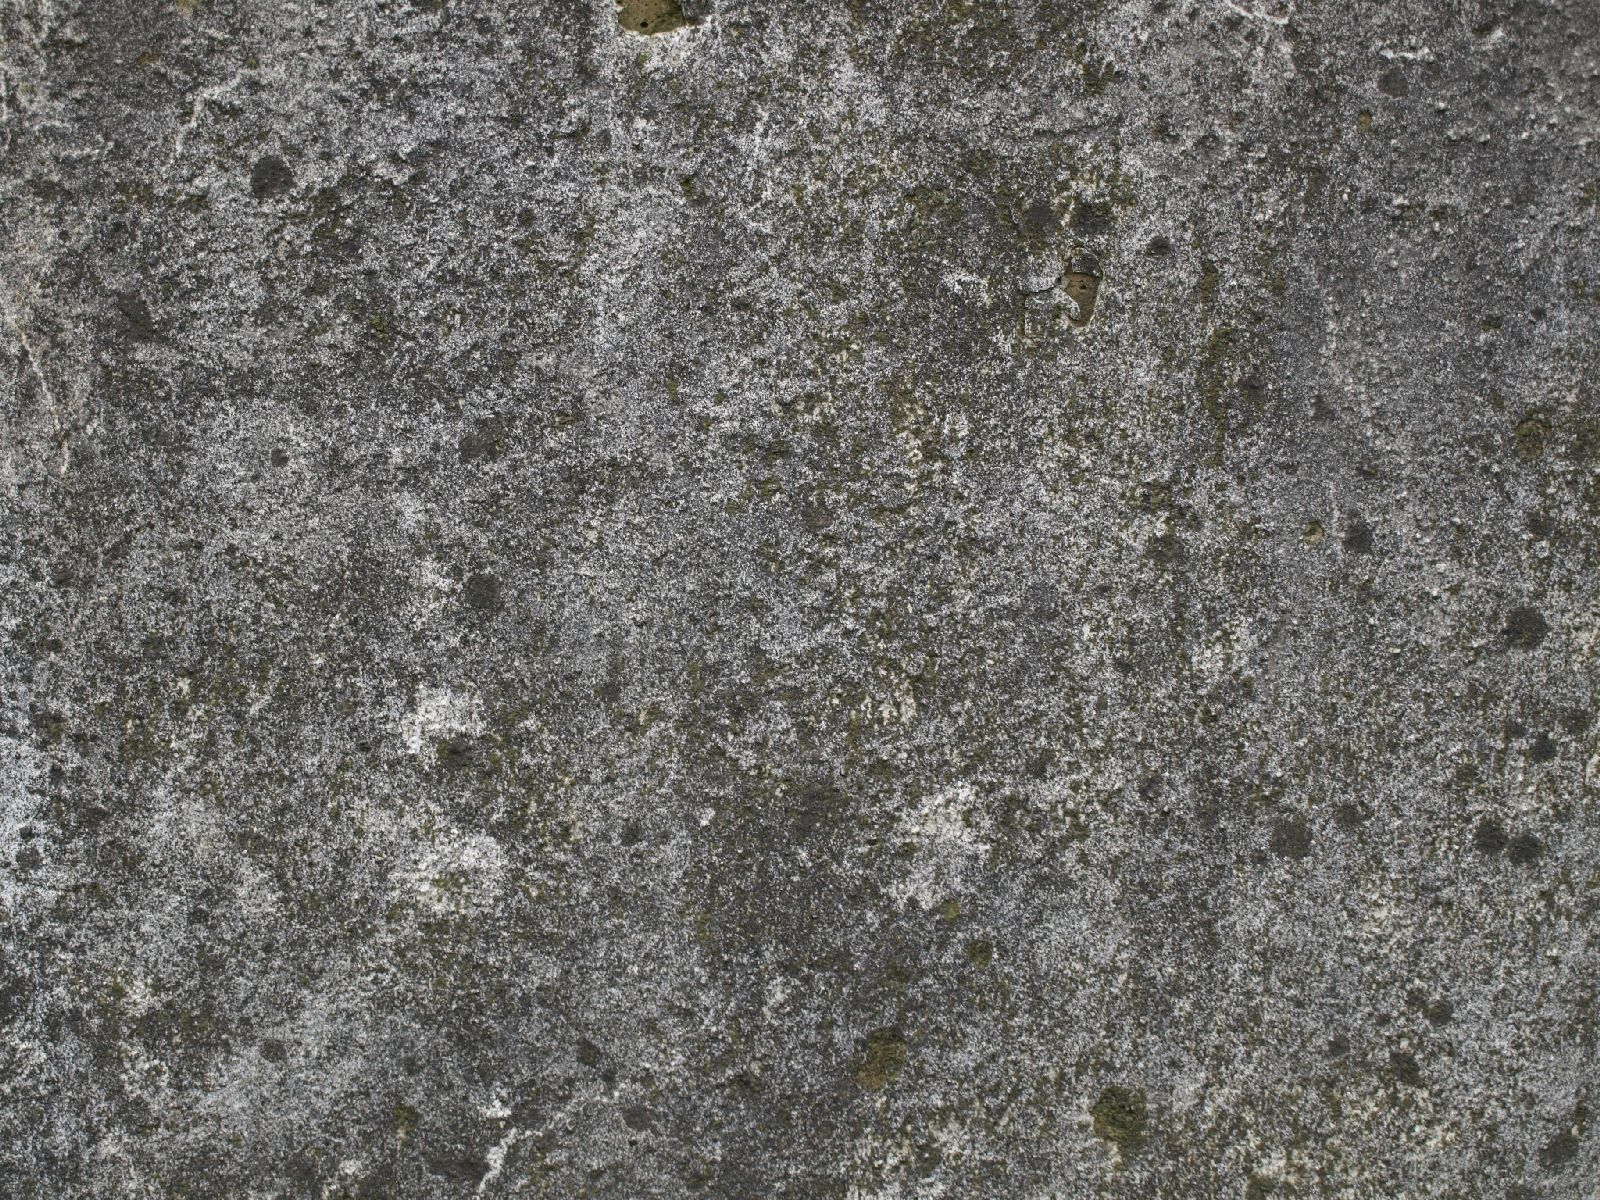 Stein-Felsen_Textur_A_PB026428